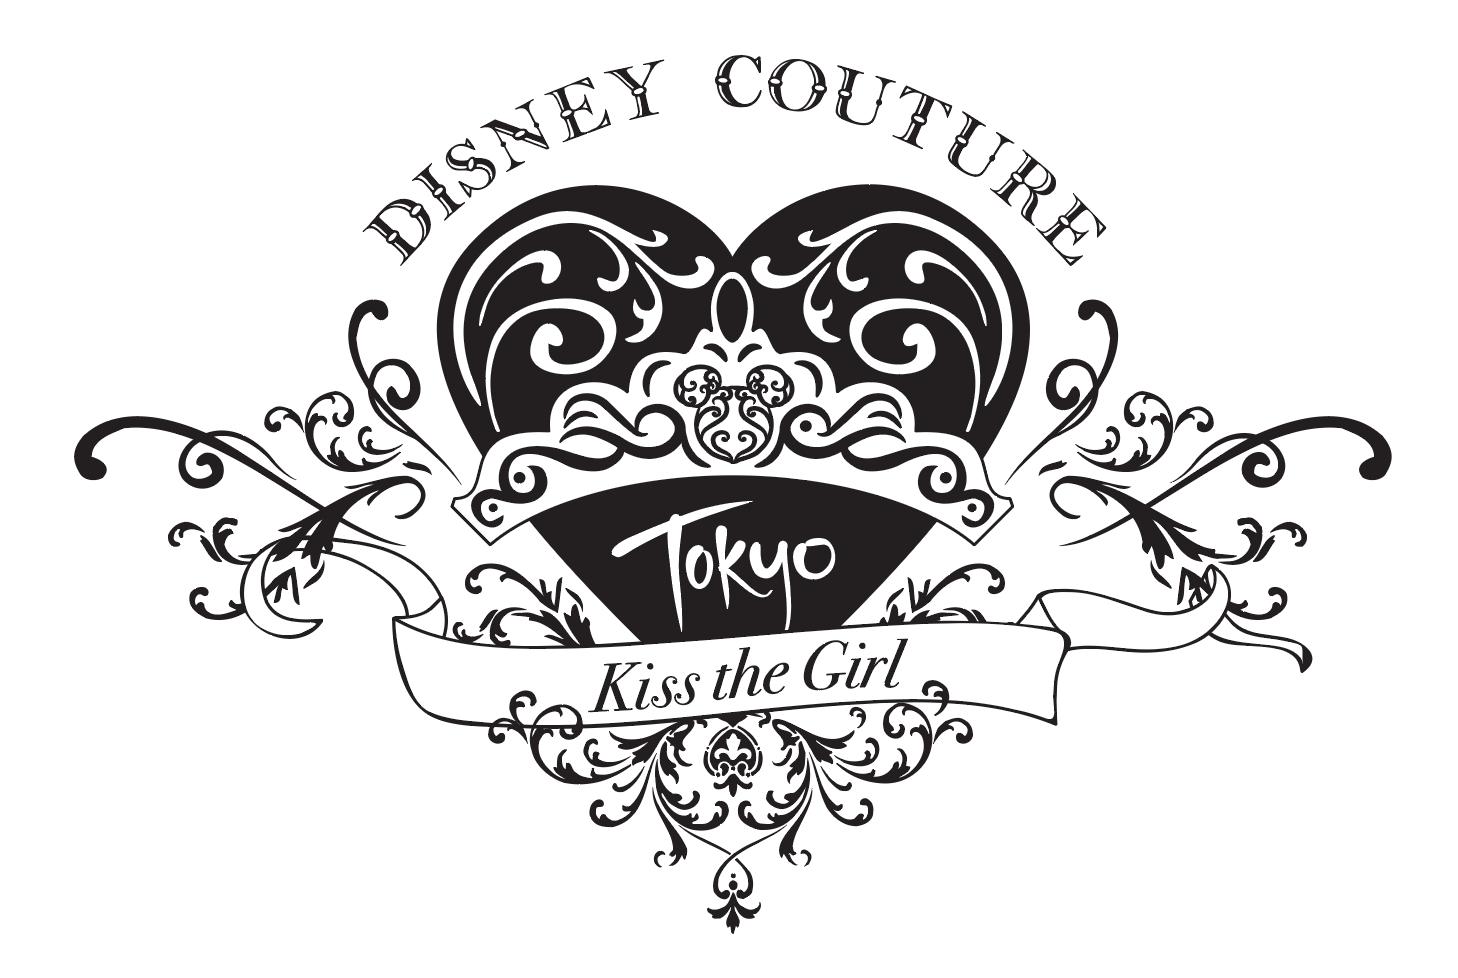 Disney Couture Tokyo